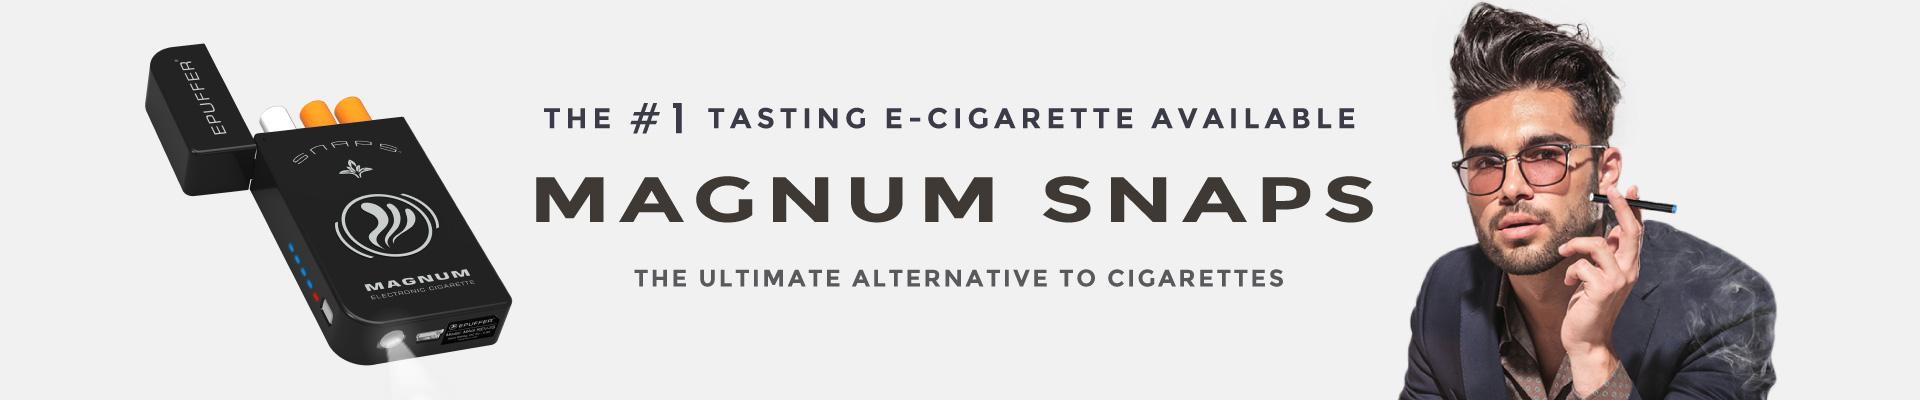 magnum snaps black ecigarettes